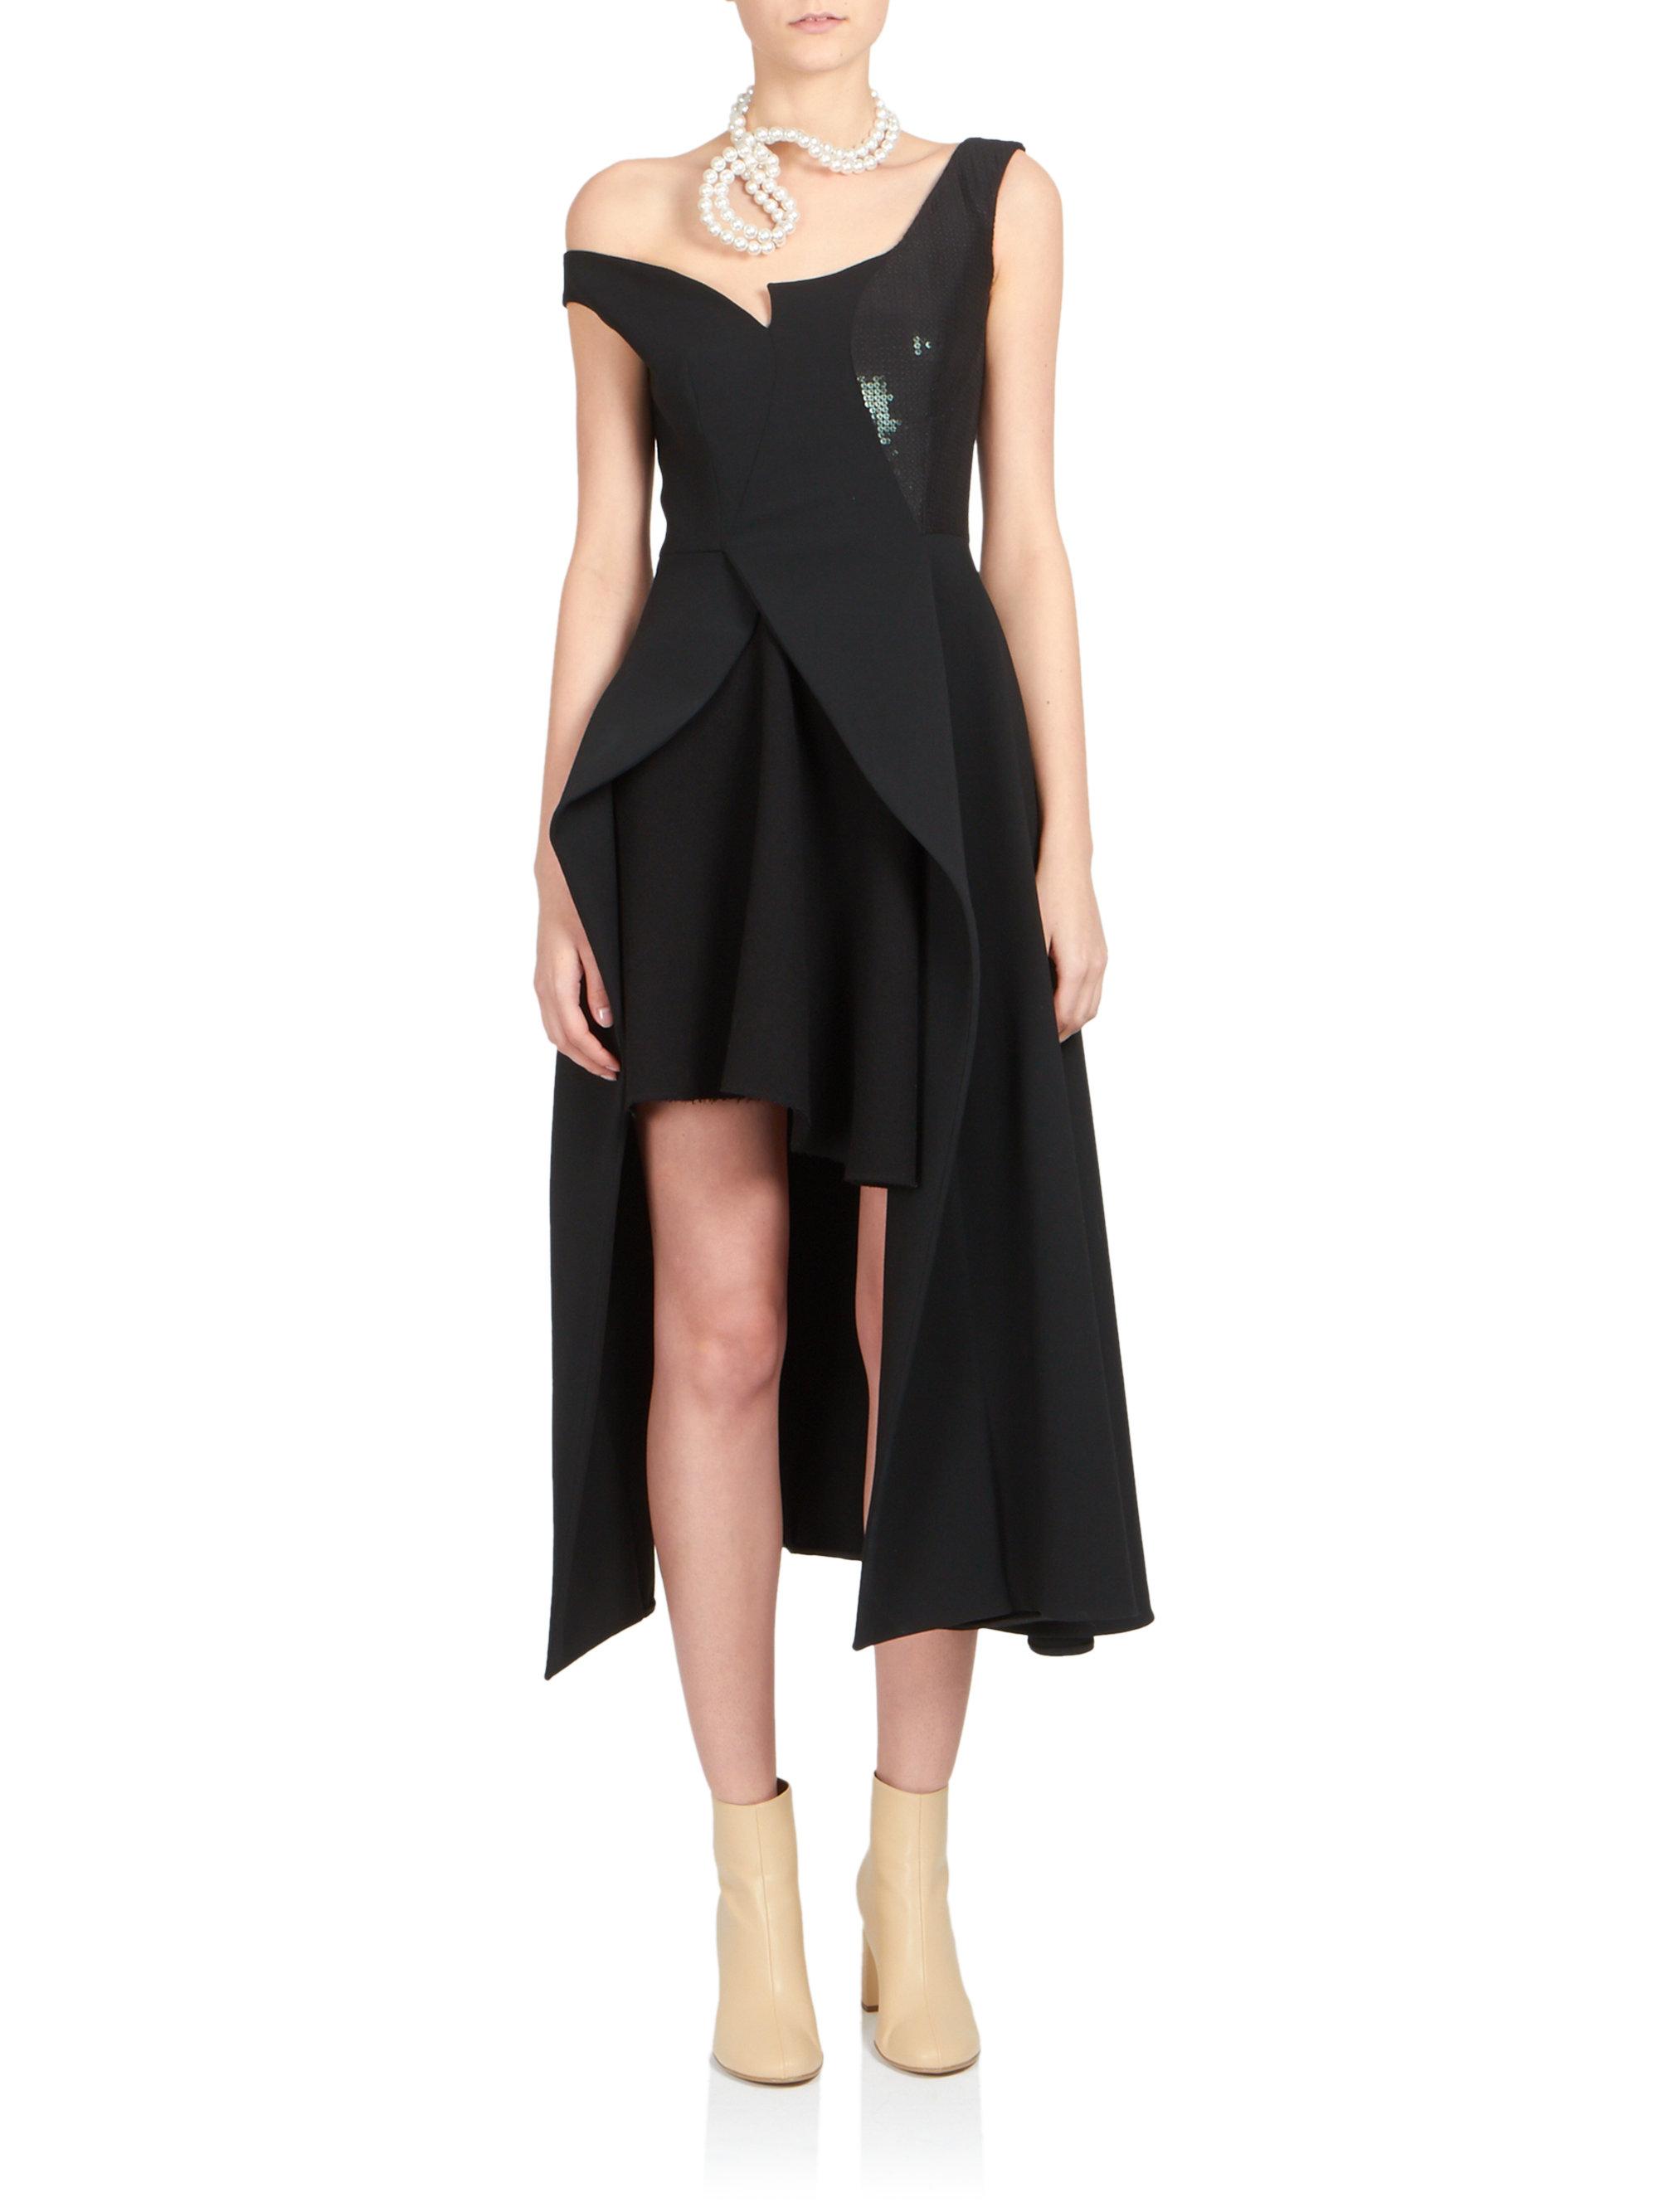 1bae430f898 Stella Mccartney Black Cocktail Dresses